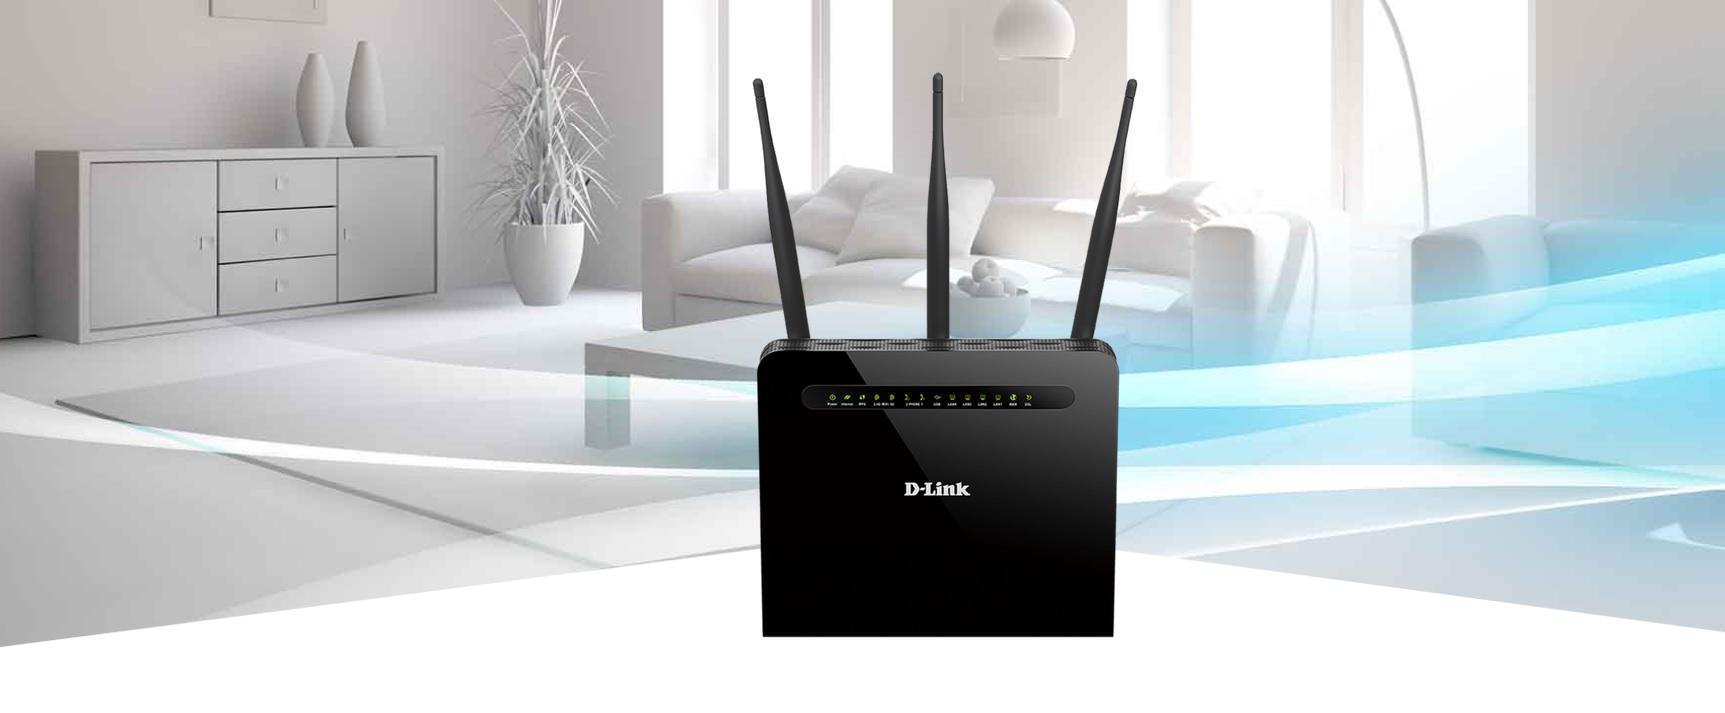 D-Link DVA-2800 Dual Band Wireless AC1600 Intro